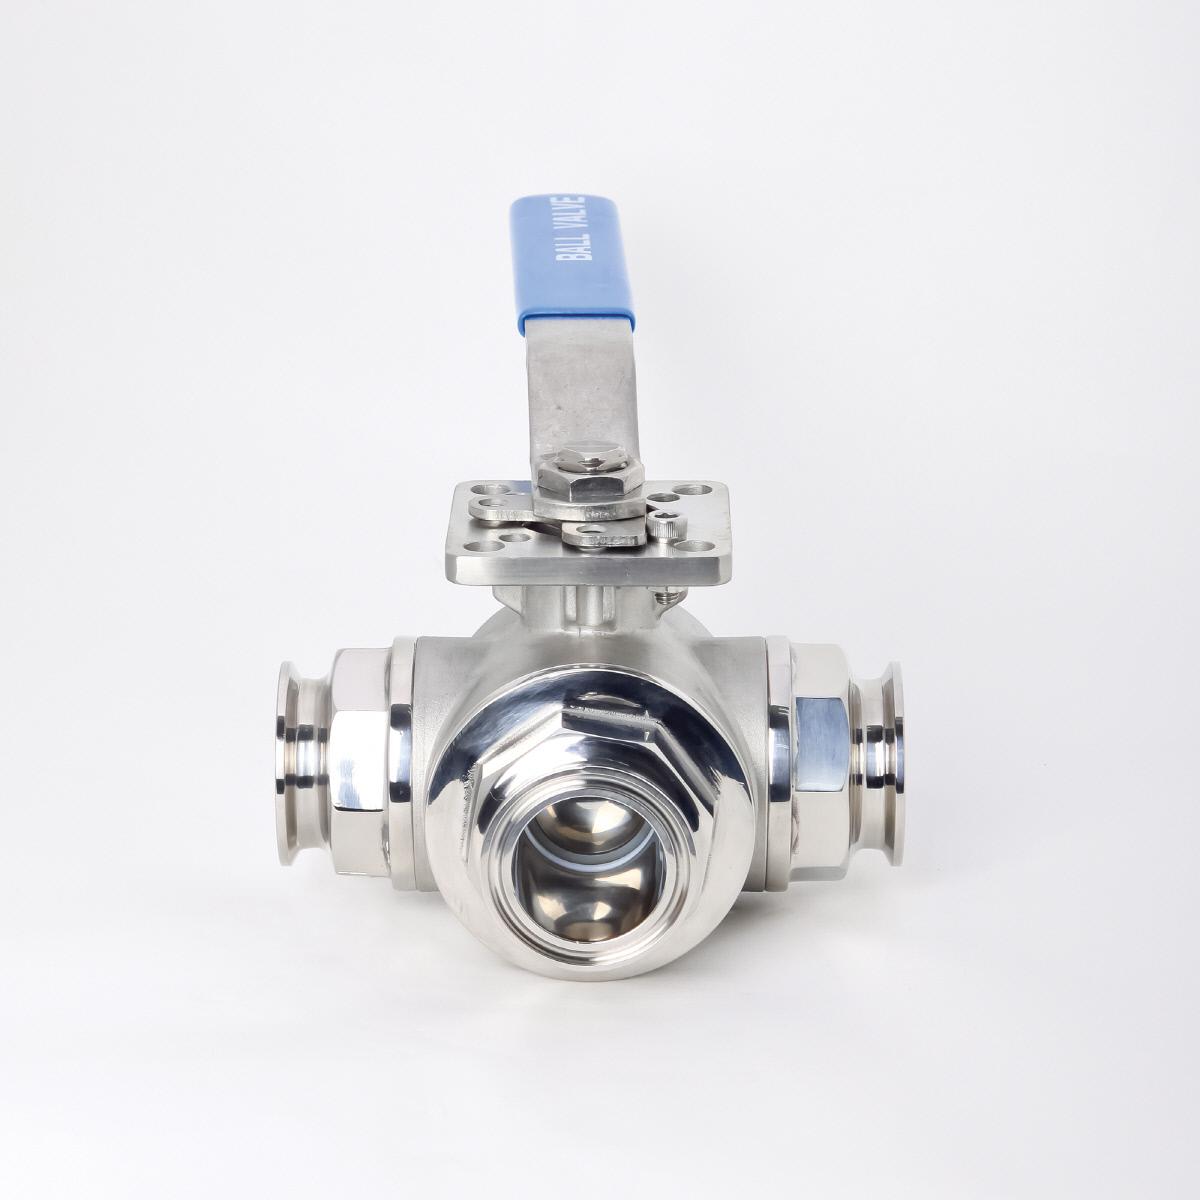 S-valve_0084.jpg